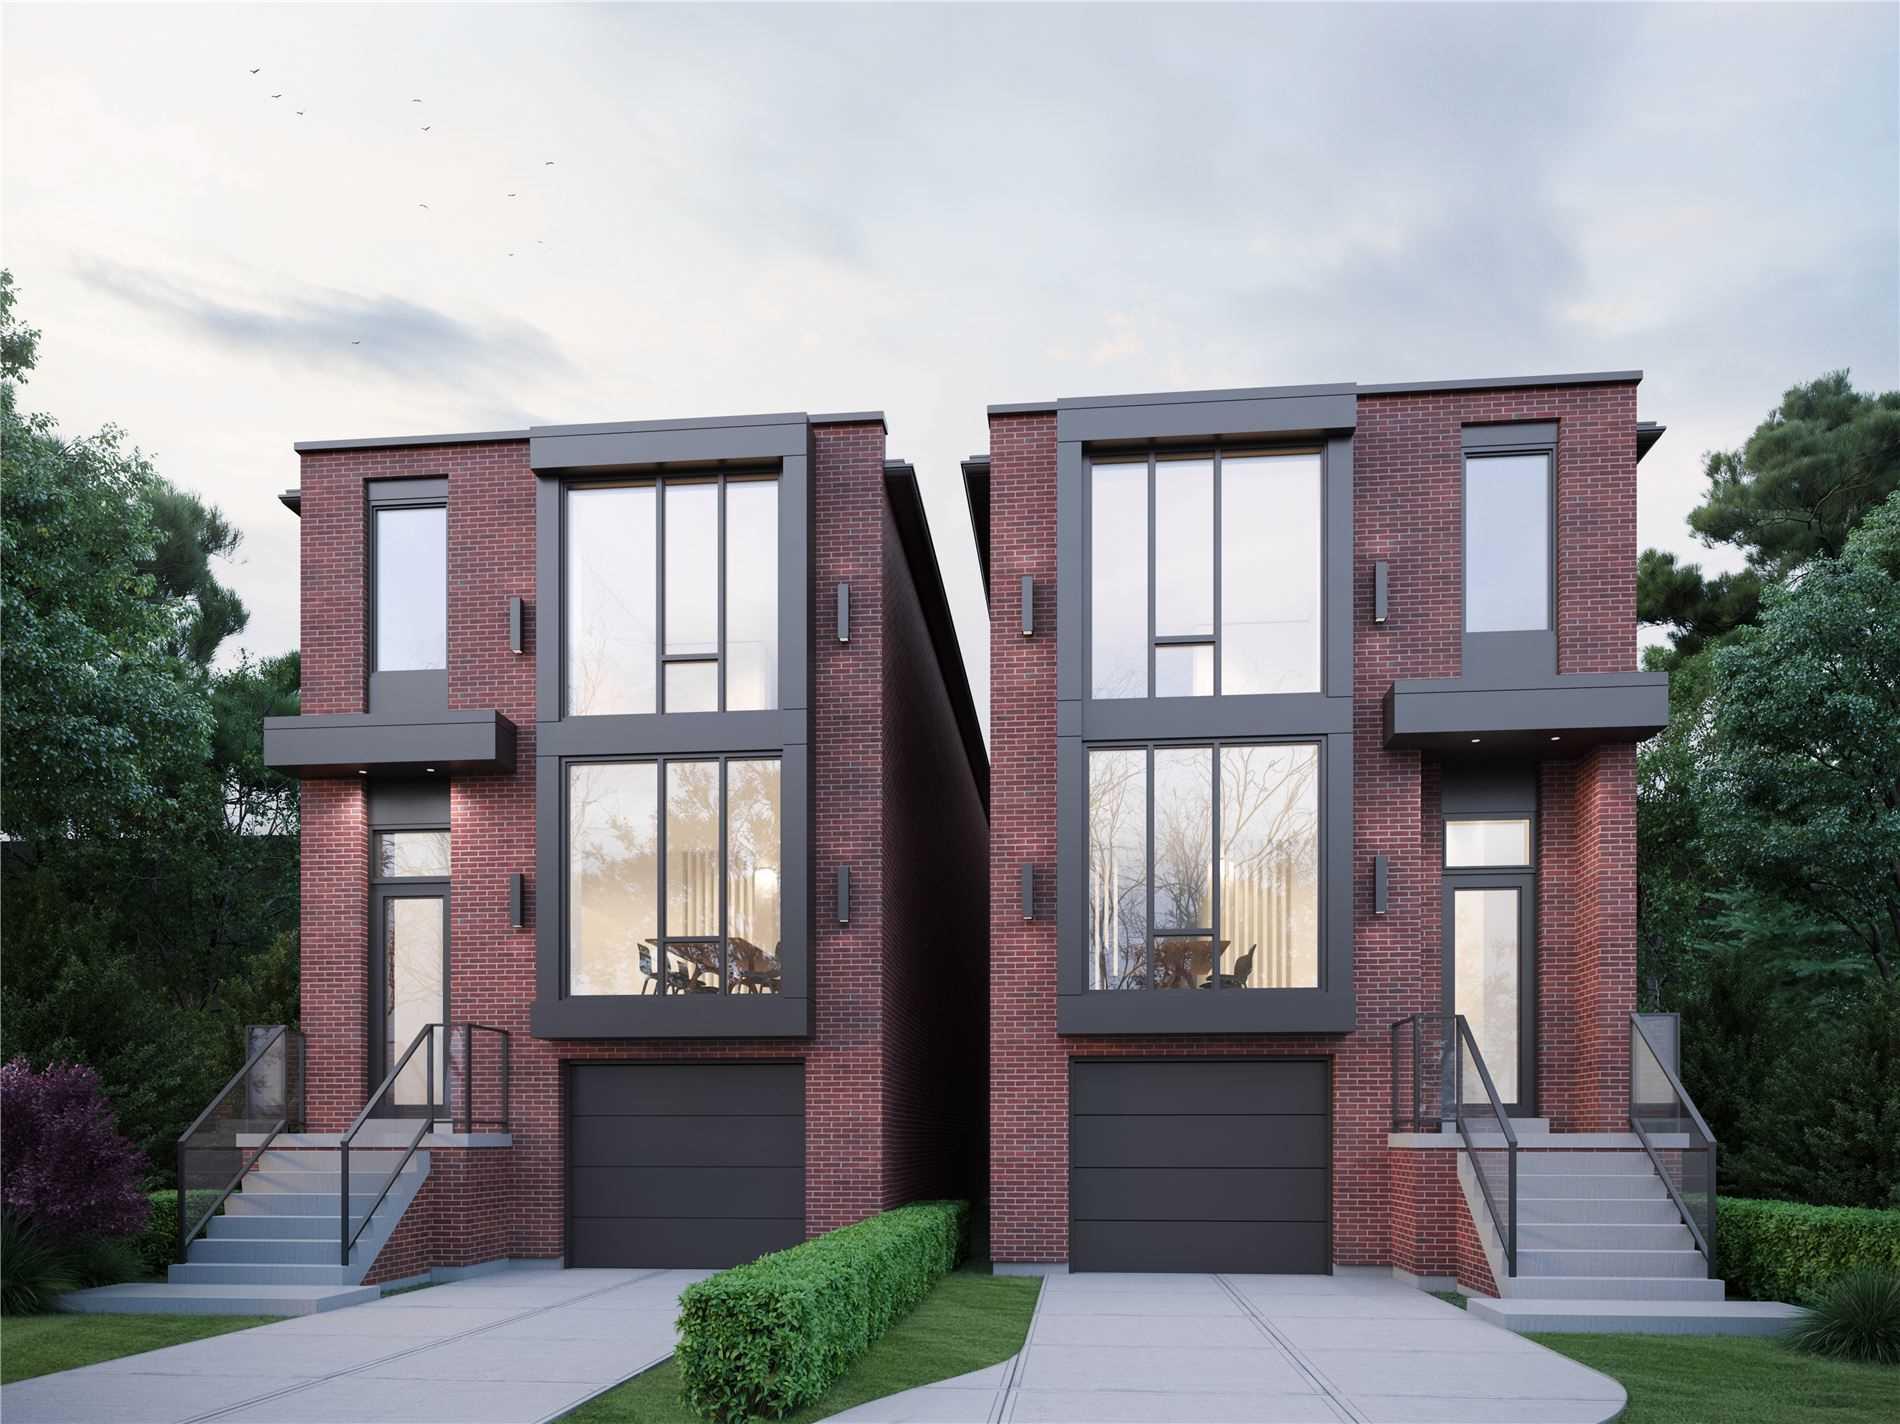 216 Delta St, Toronto, Ontario M8W4E6, 3 Bedrooms Bedrooms, 7 Rooms Rooms,4 BathroomsBathrooms,Detached,For Sale,Delta,W5344642